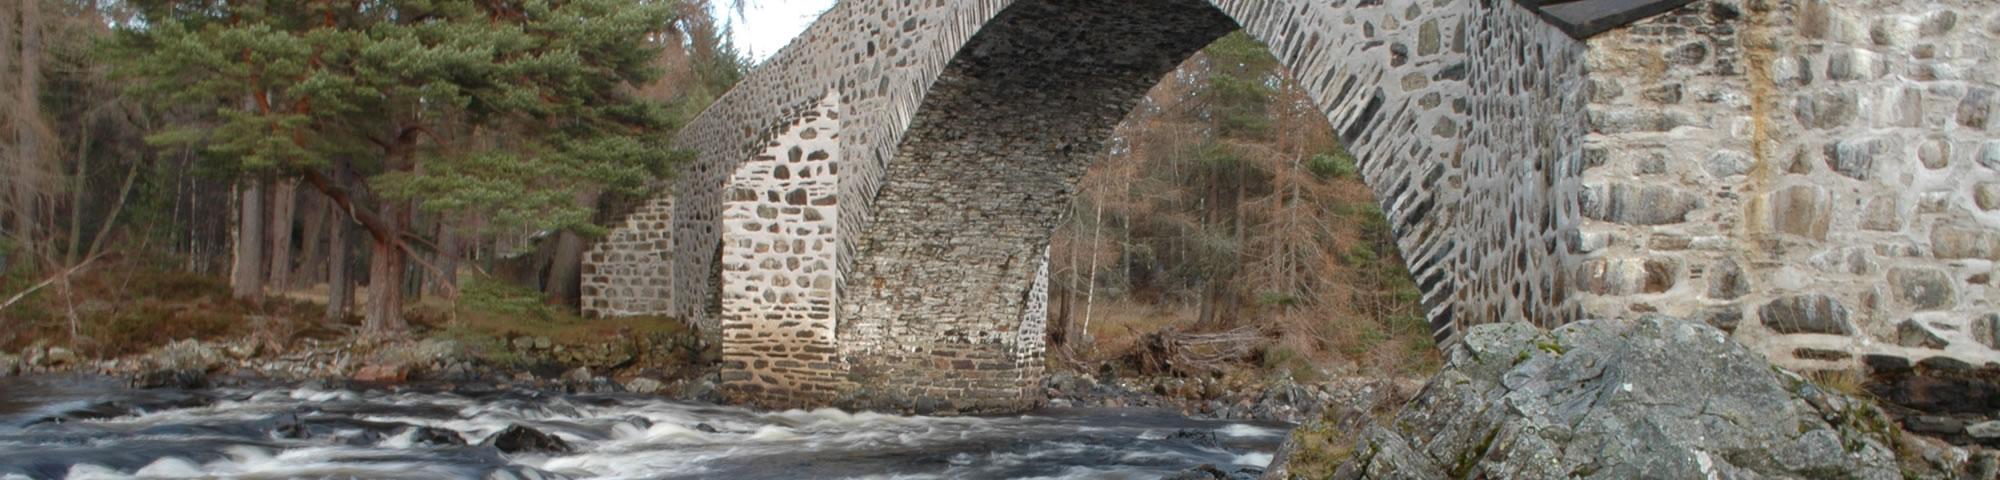 The Old Bridge of Dee, Invercauld, Braemar